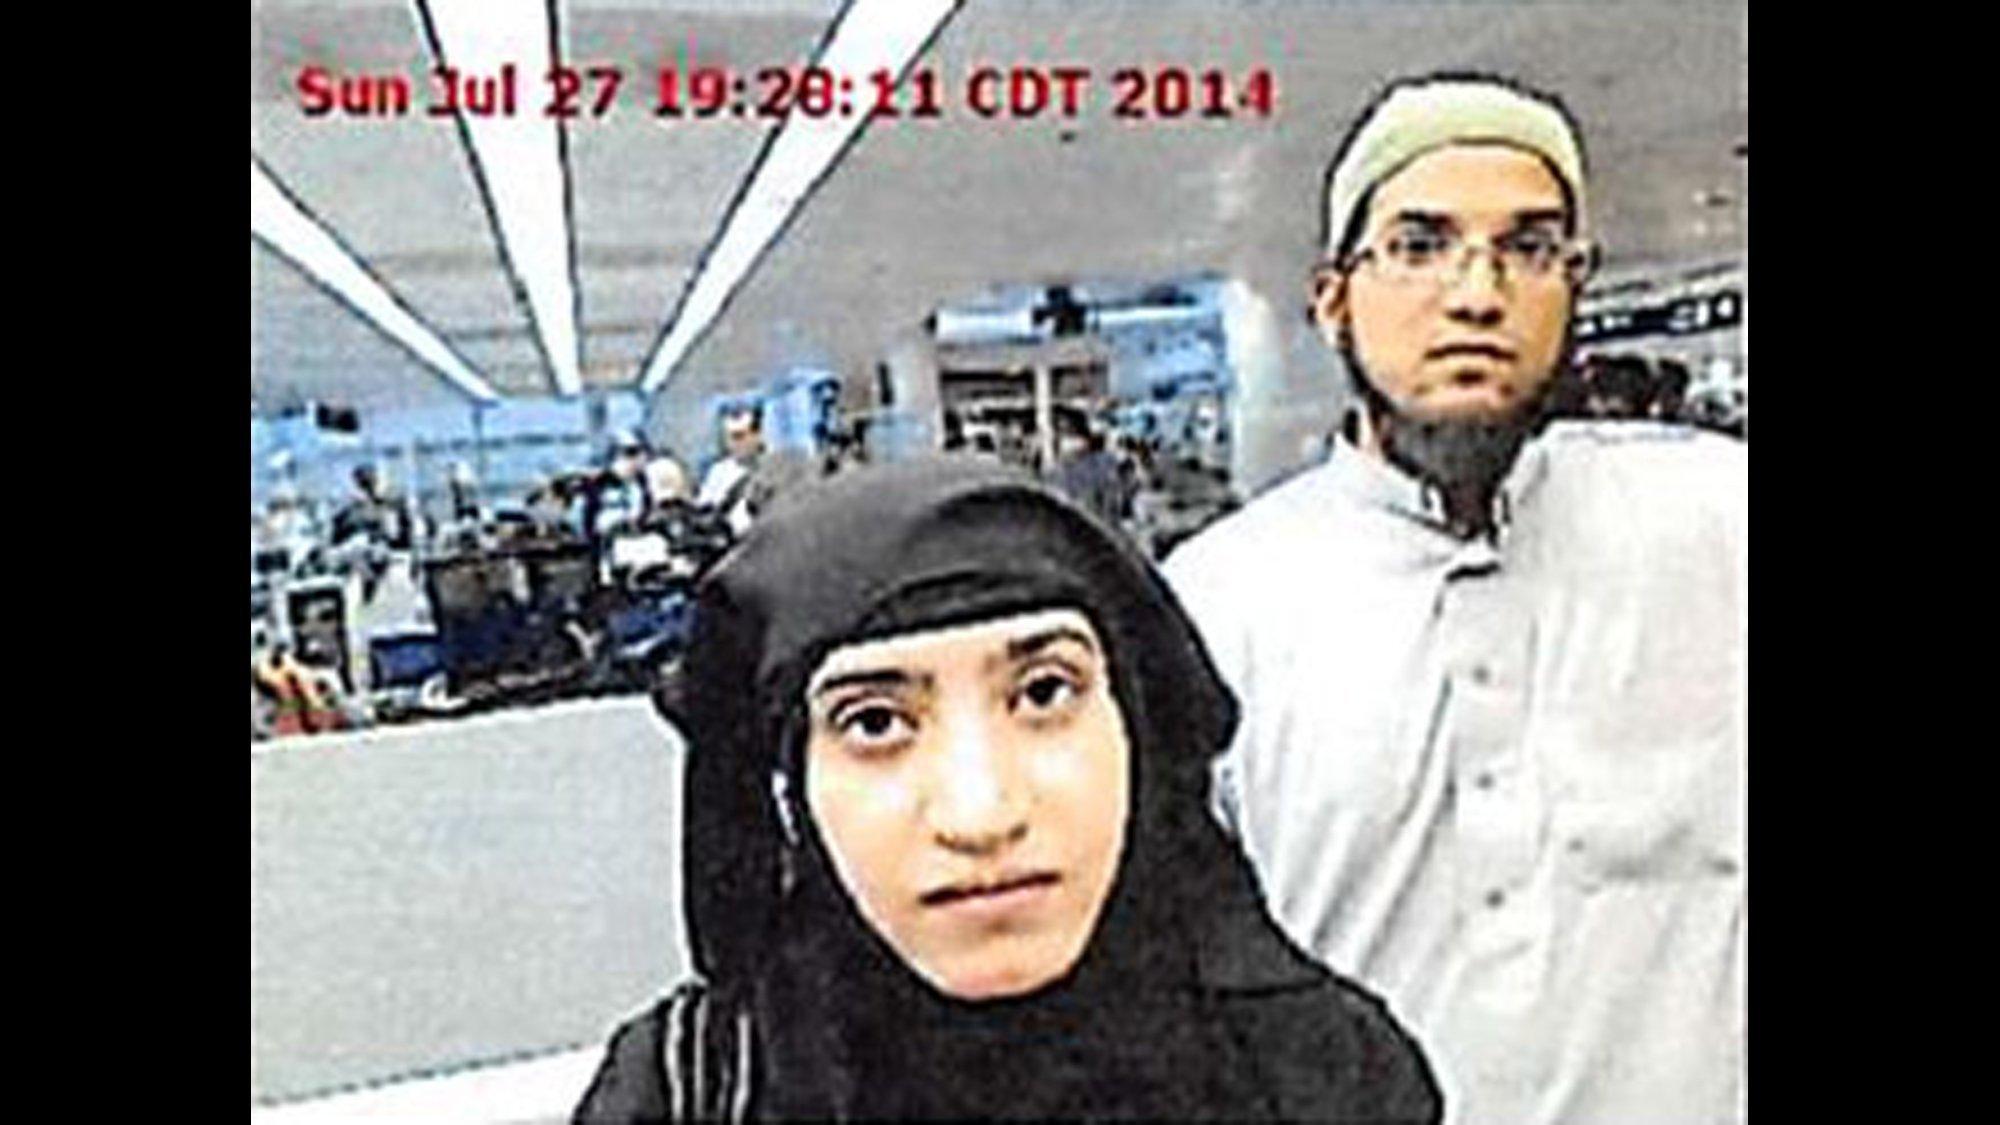 Tashfeen Malik and Syed Rizwan Farook were photographed at O'Hare Airport in 2014.